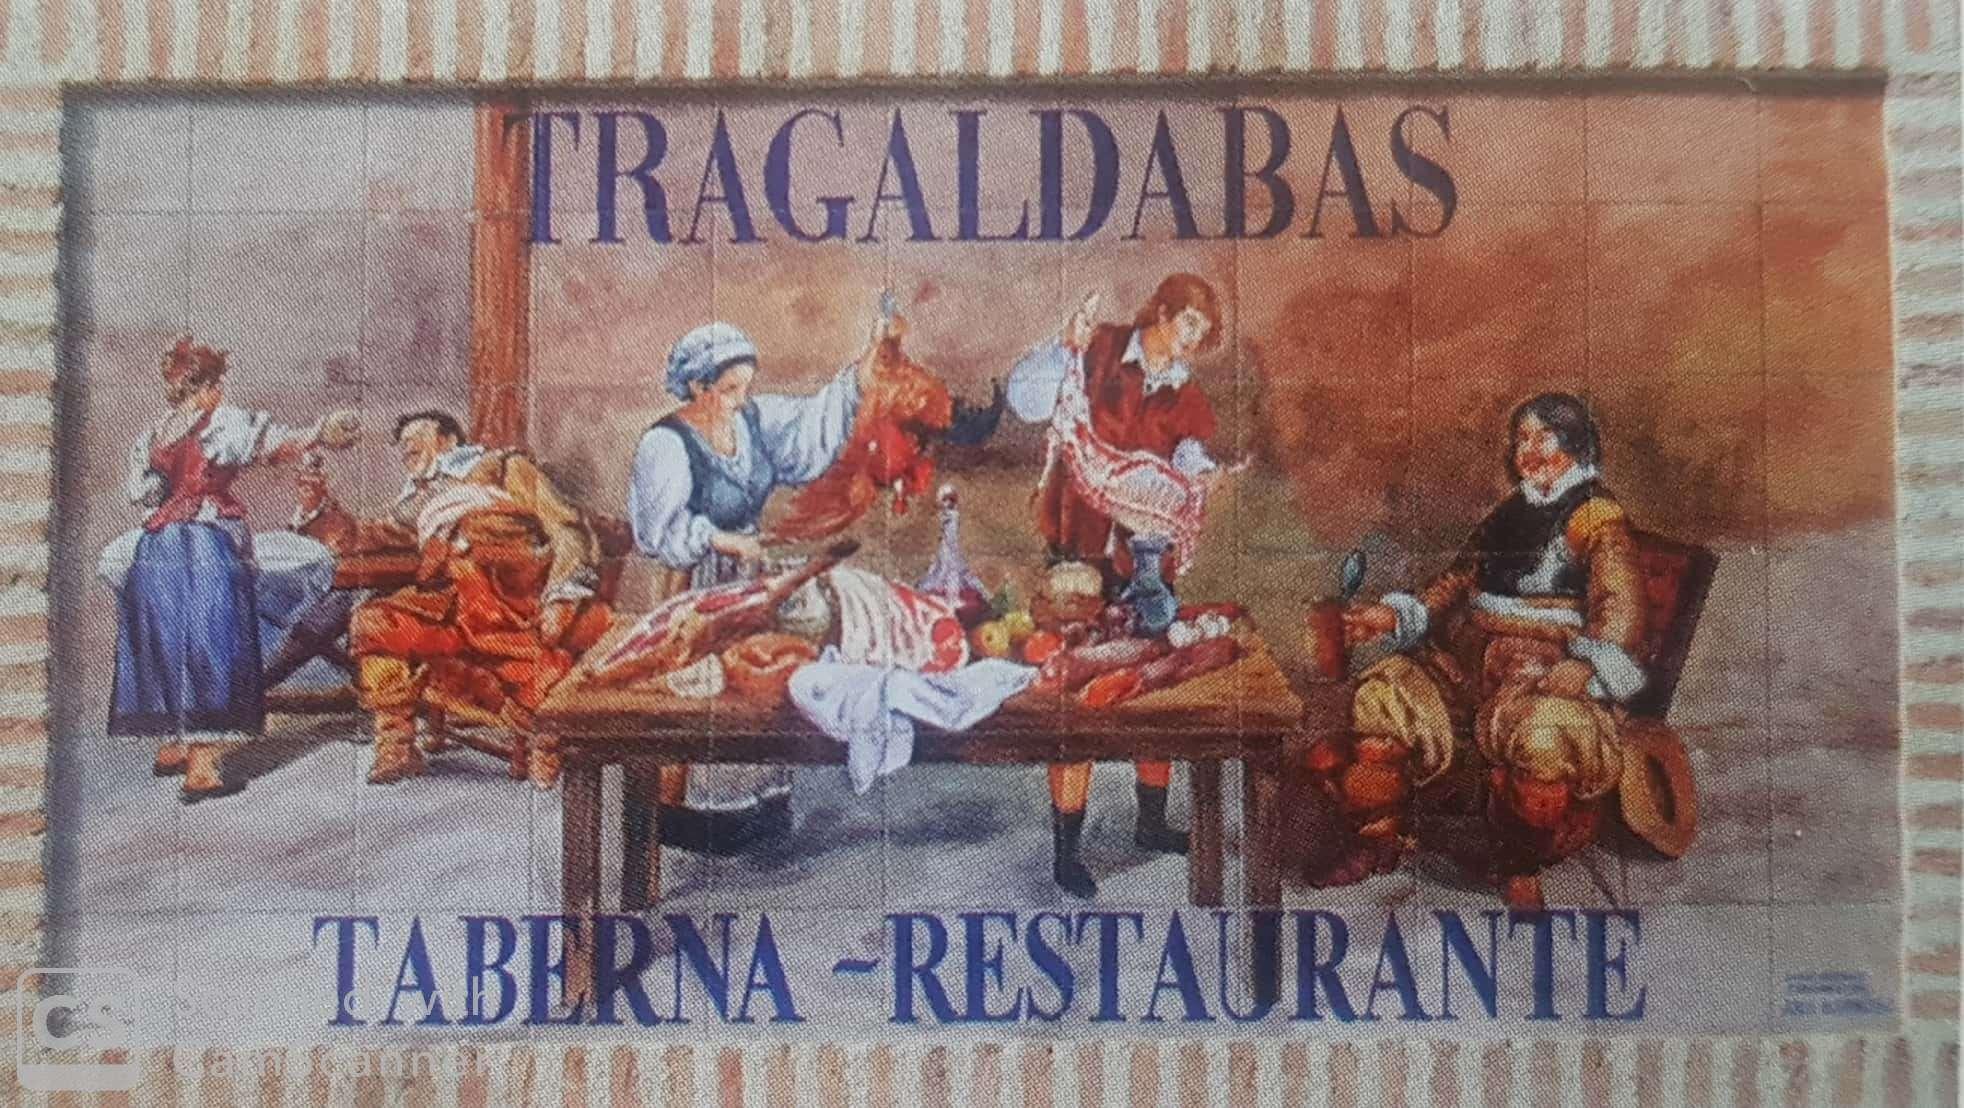 Restaurante Tragaldabas